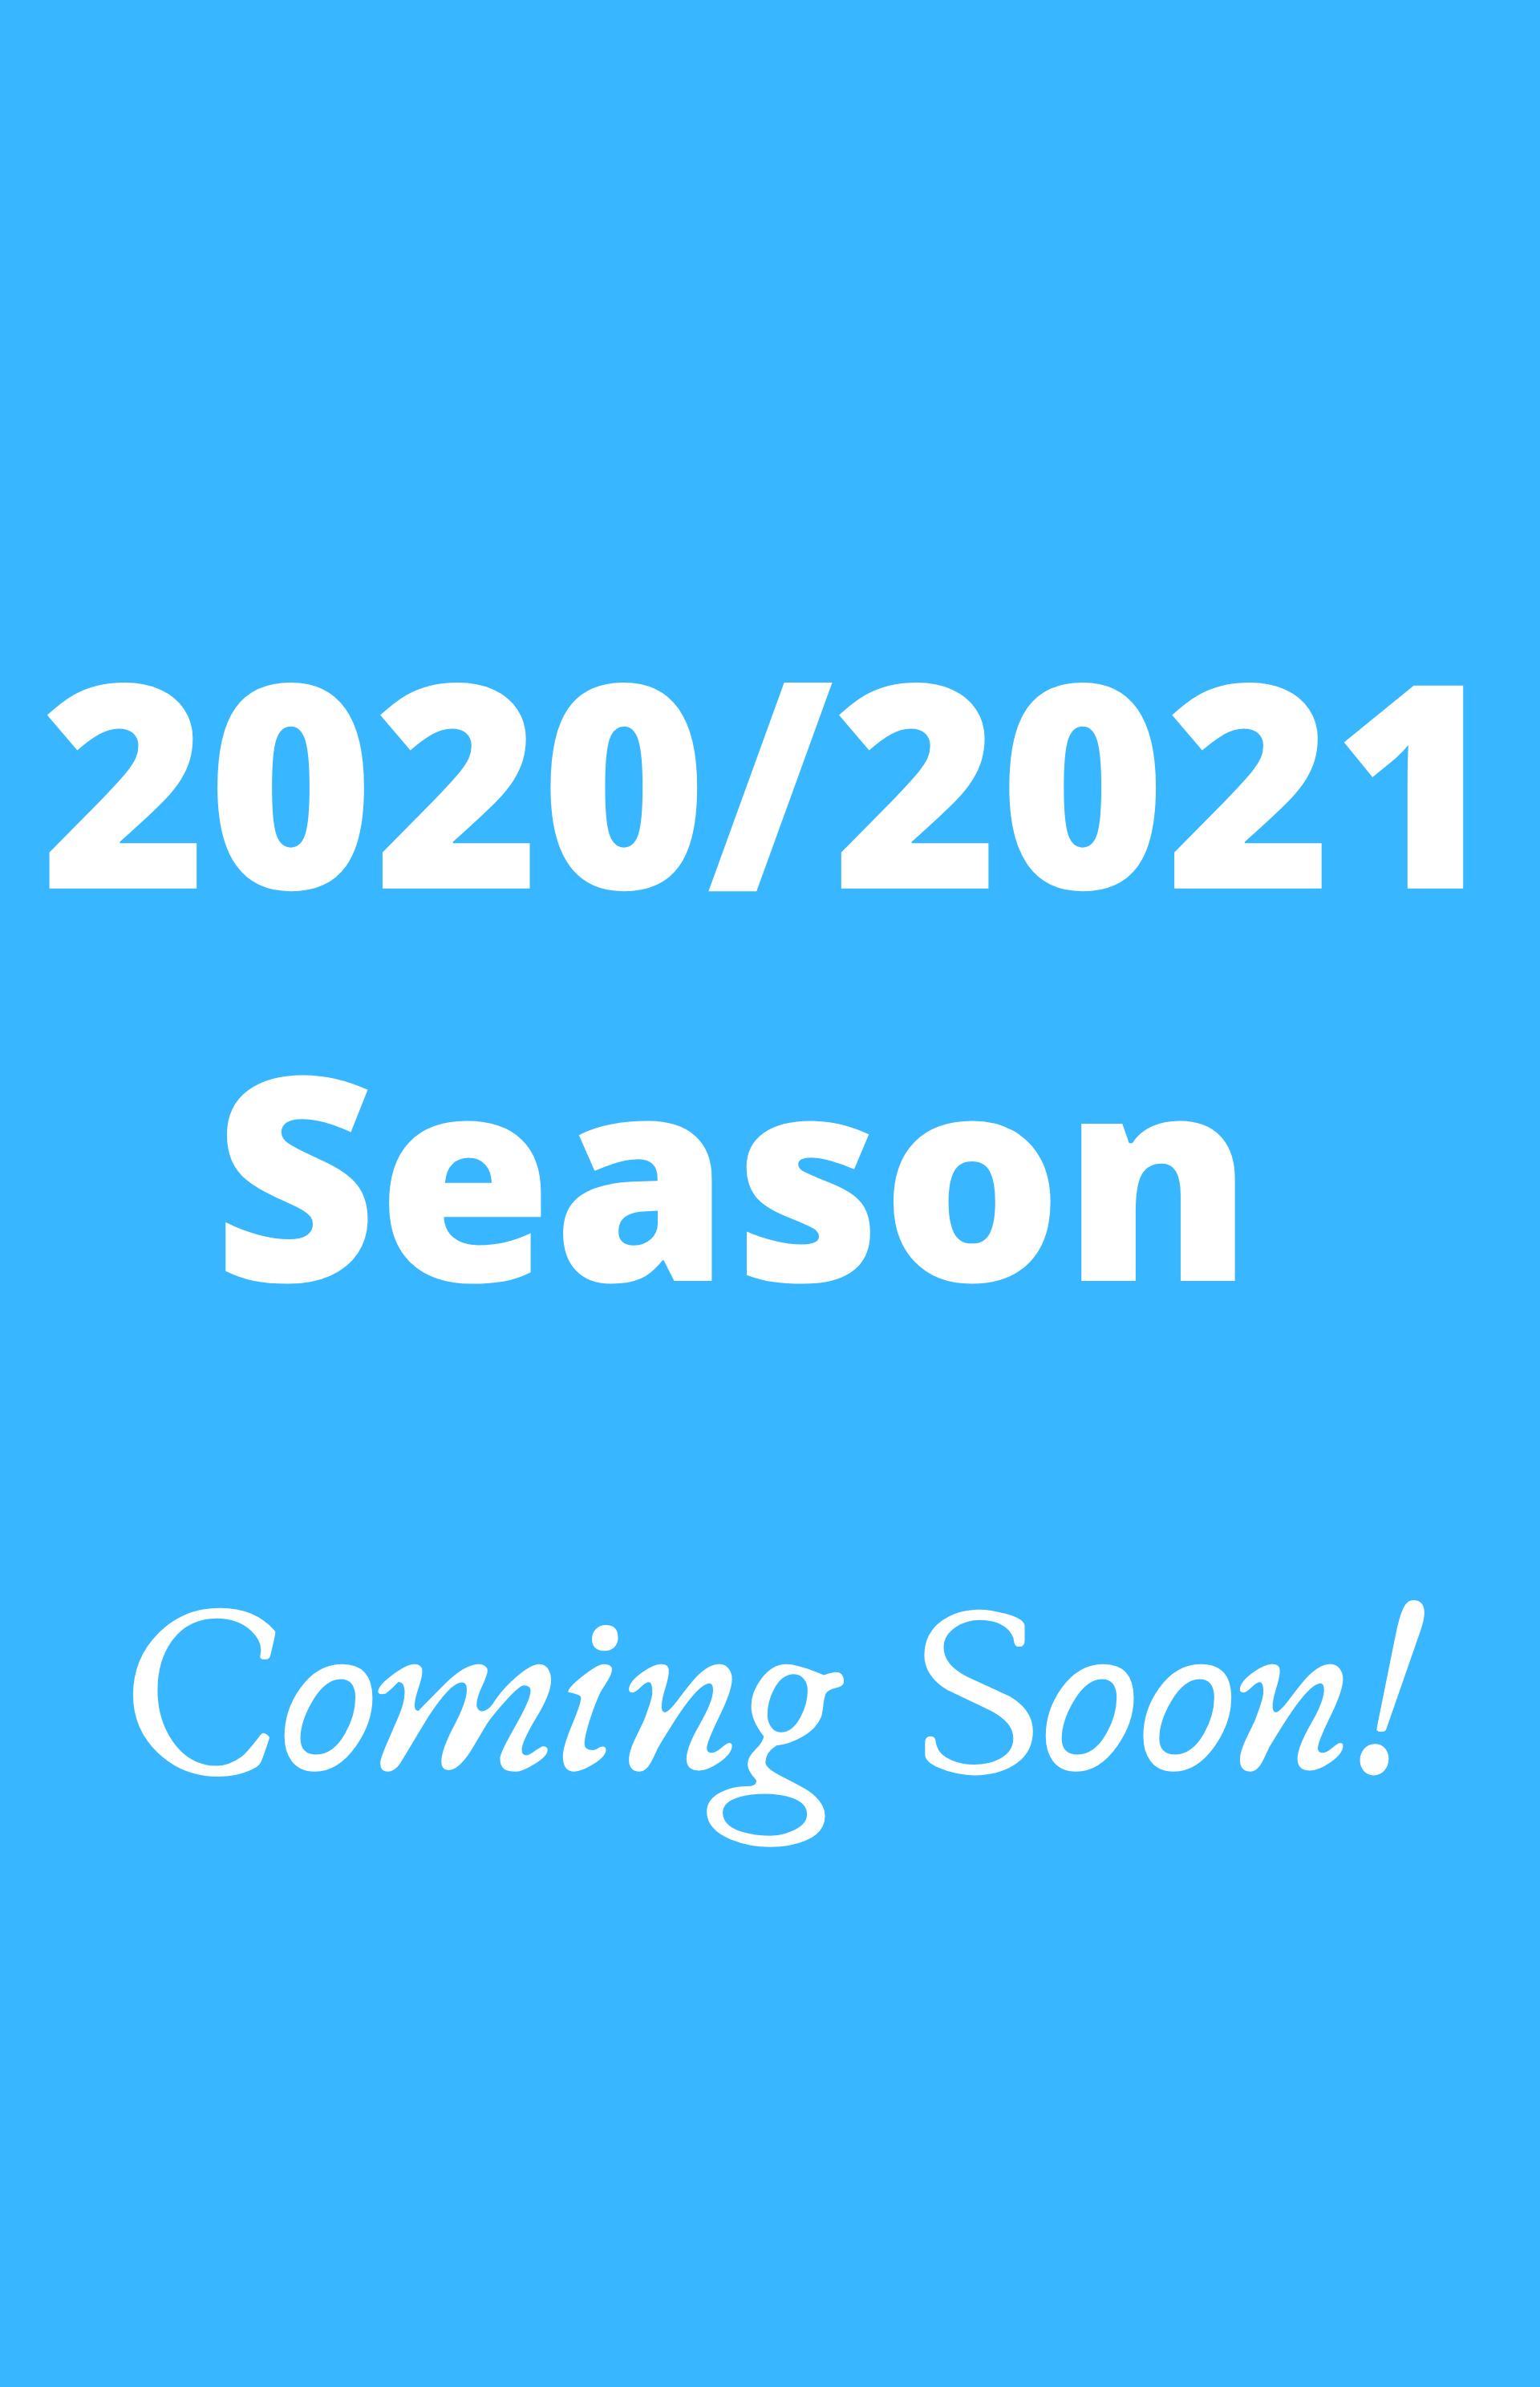 2020/2021 Season